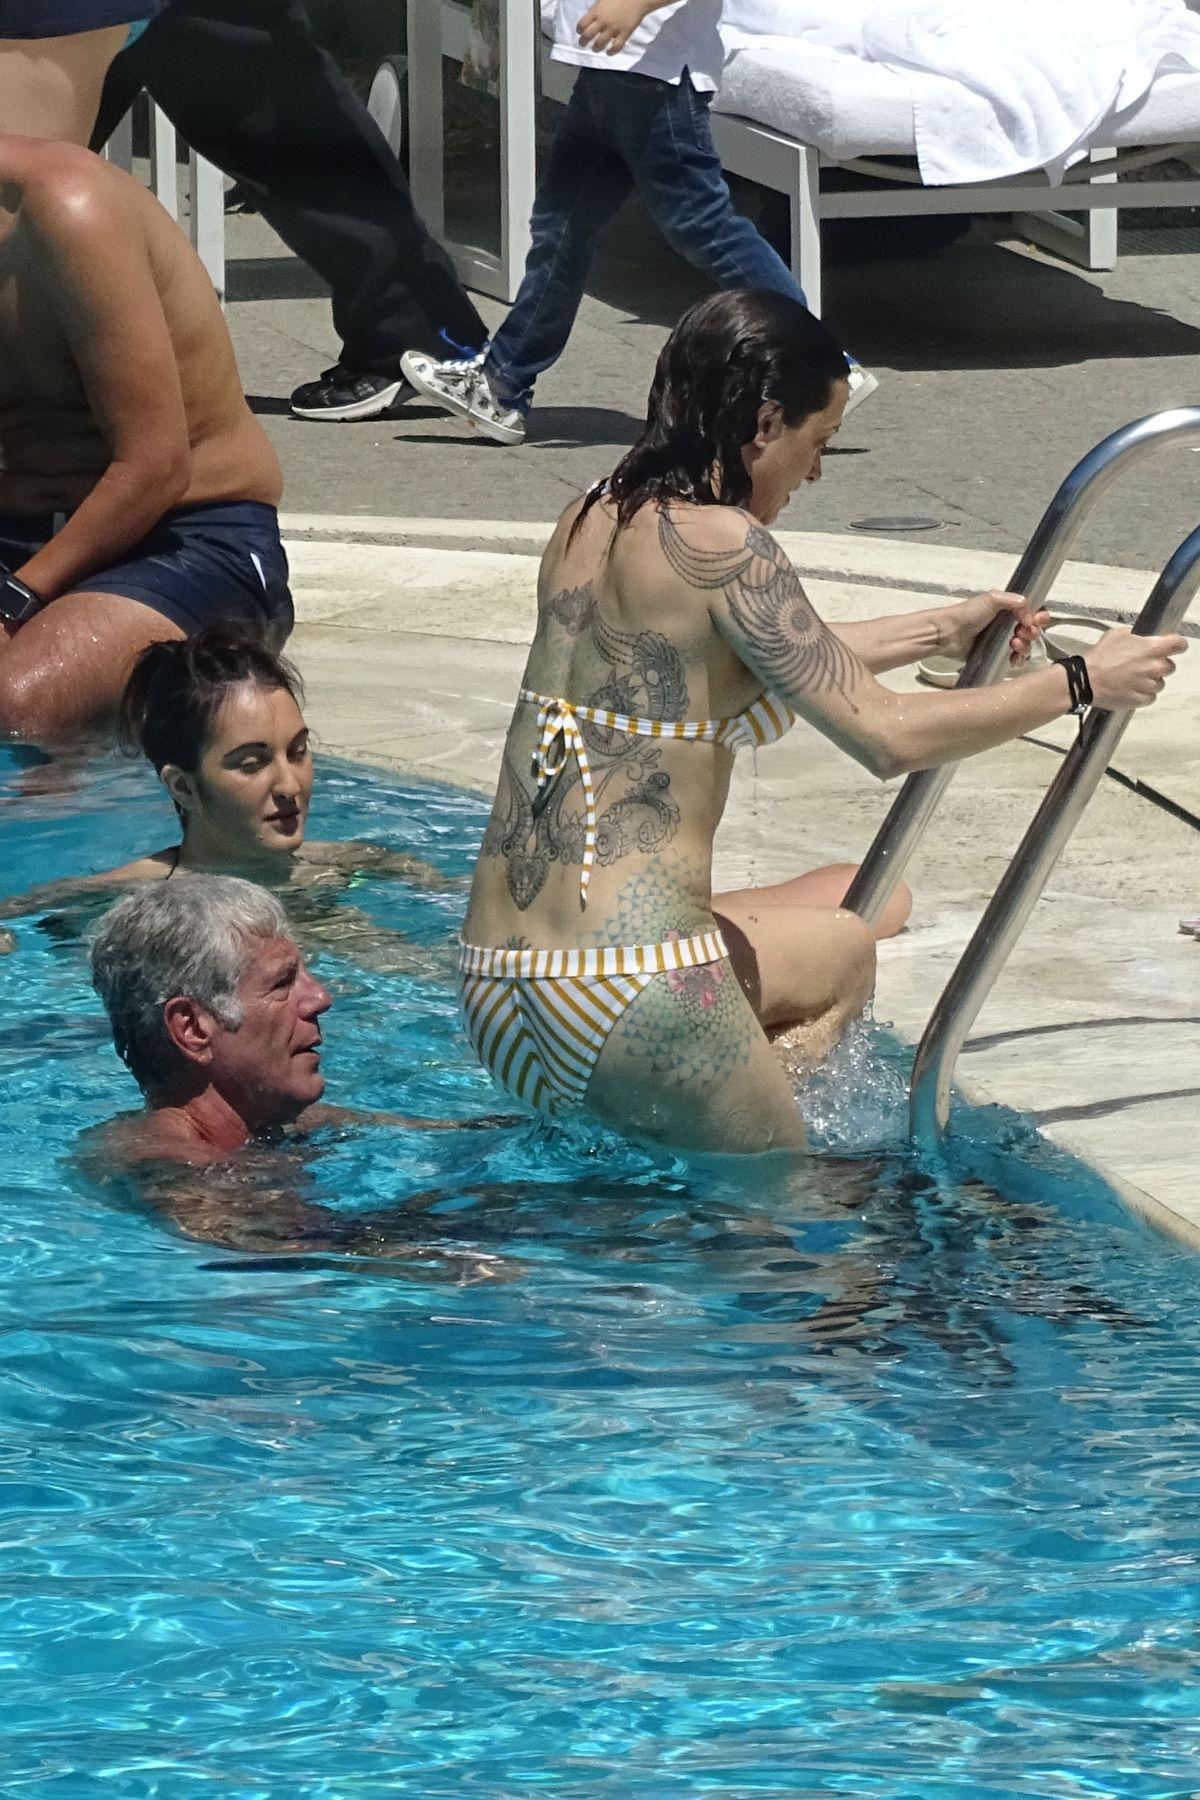 Bikini Asia Argento nude (42 photo), Tits, Sideboobs, Instagram, panties 2006